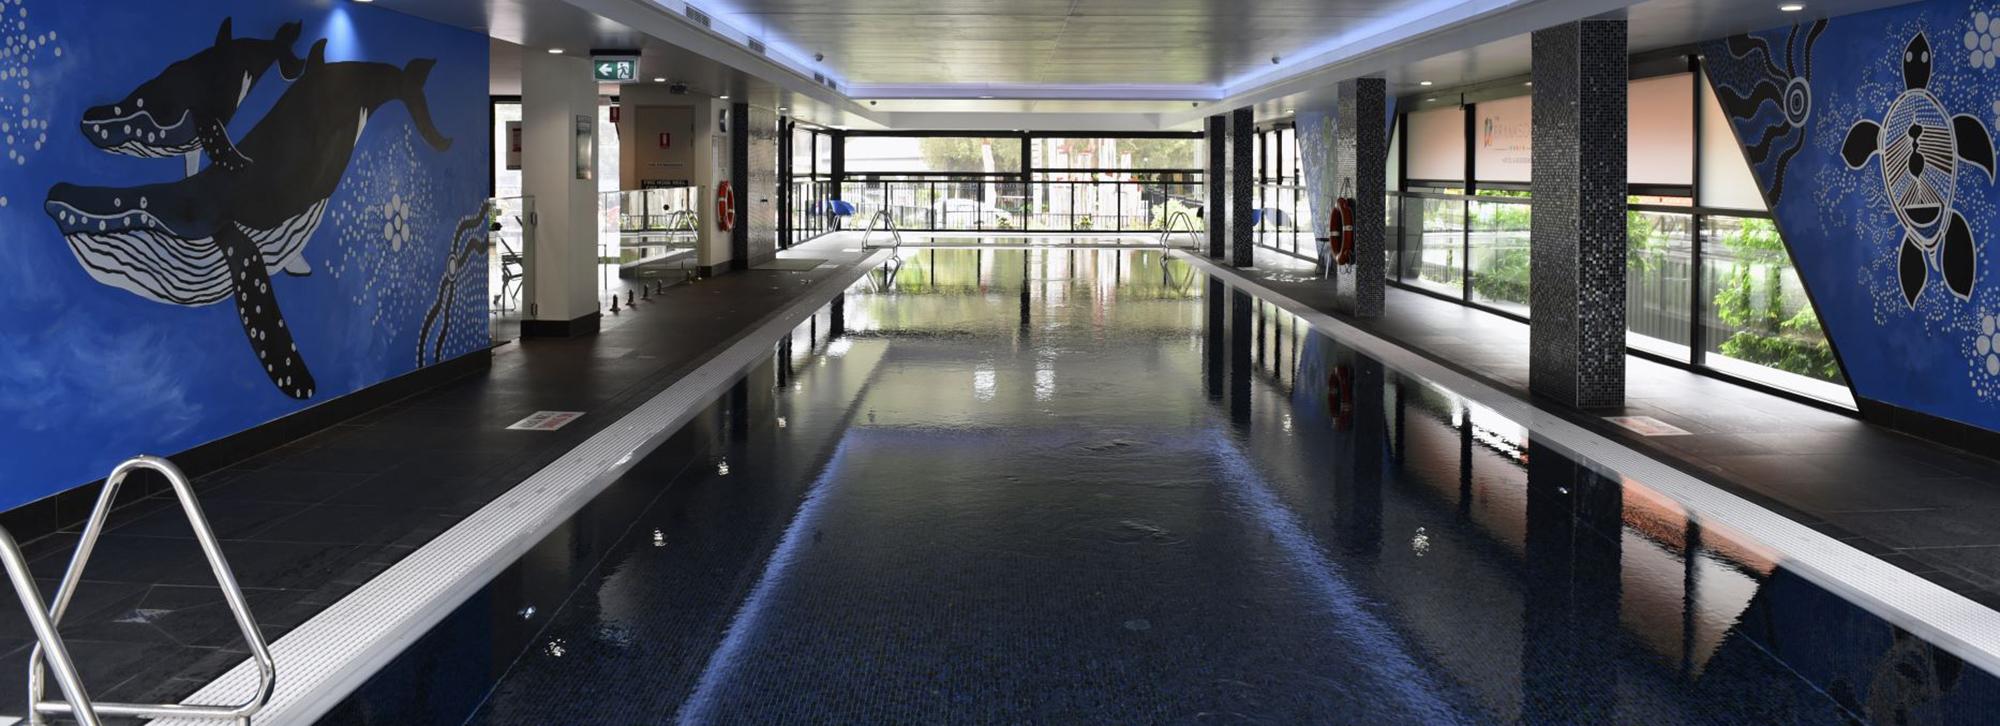 25m Indoor Heated Swimming Pool